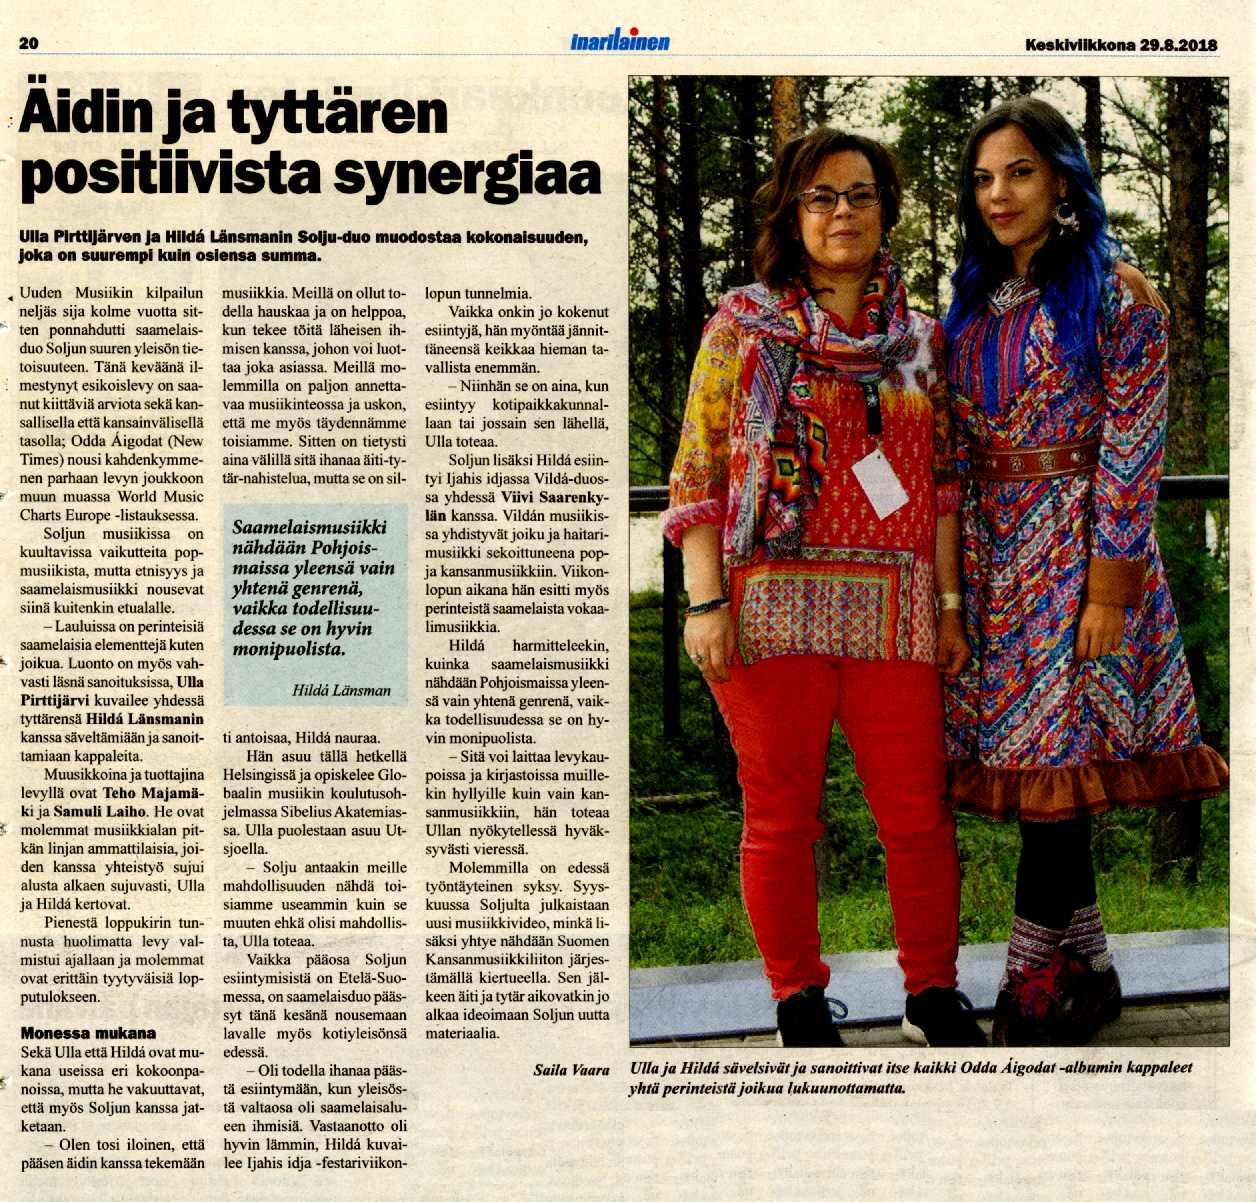 Inarilainen (Finland), 29.8.2018